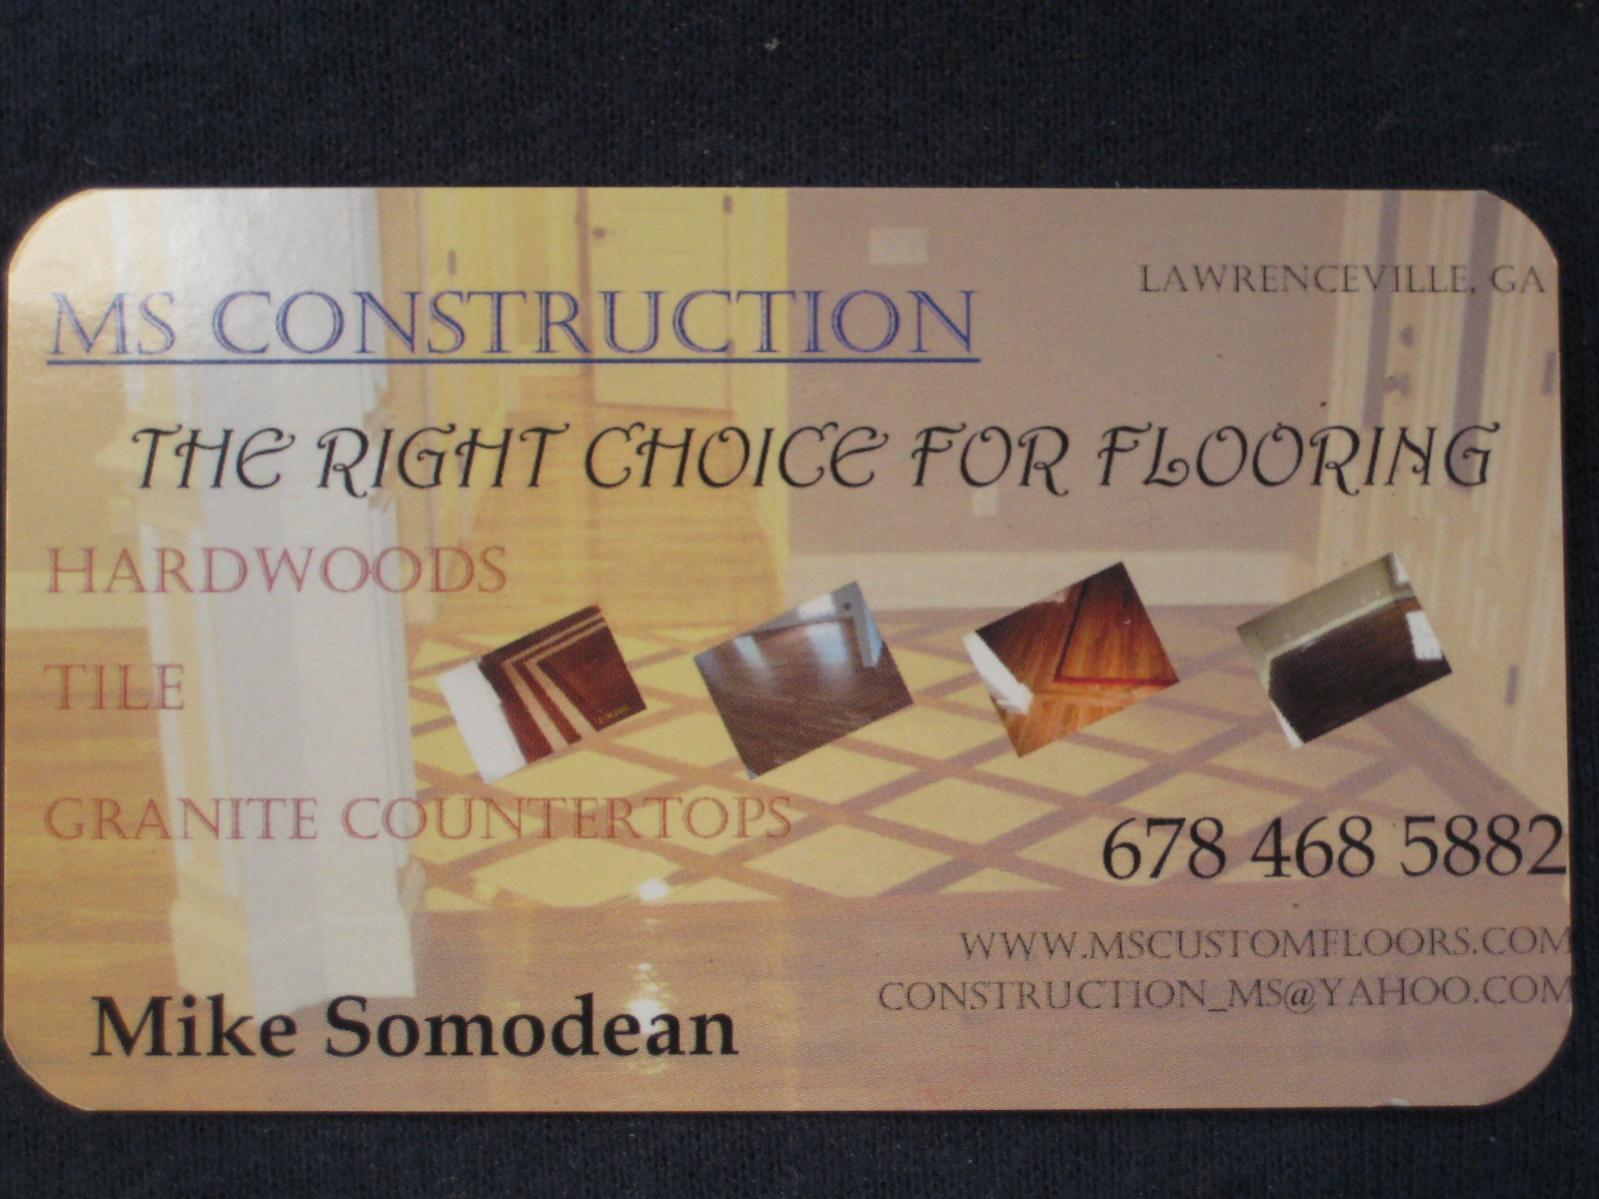 Flooring business card pertamini flooring business card colourmoves